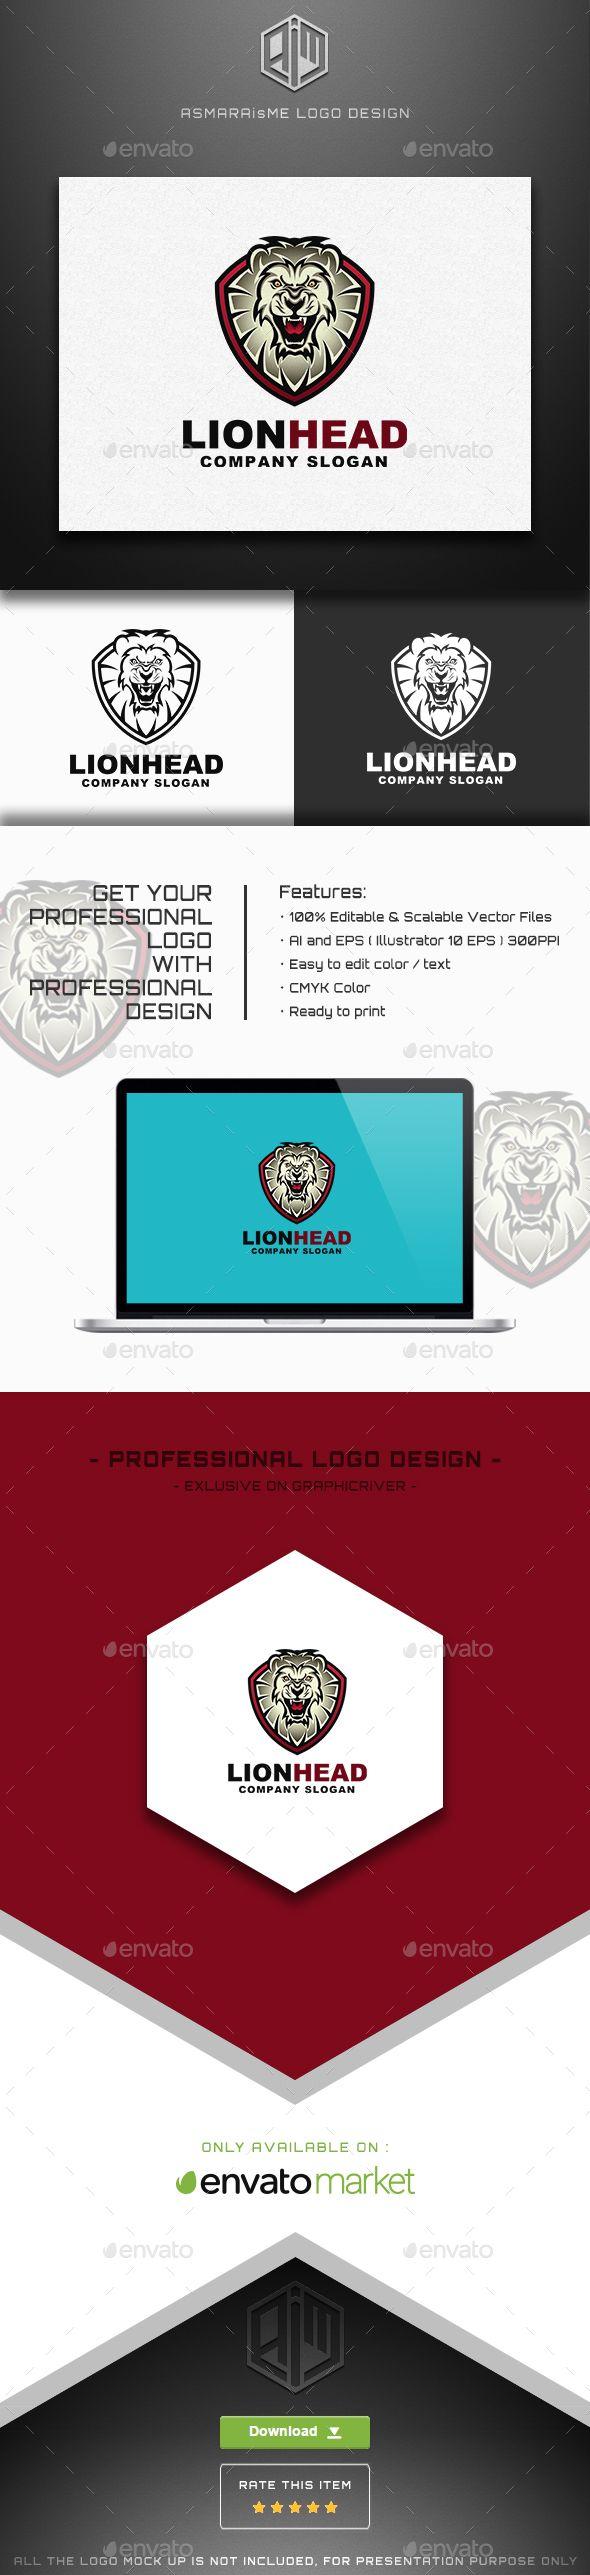 Lion Head / Lion Shield Logo - Animals Logo Templates